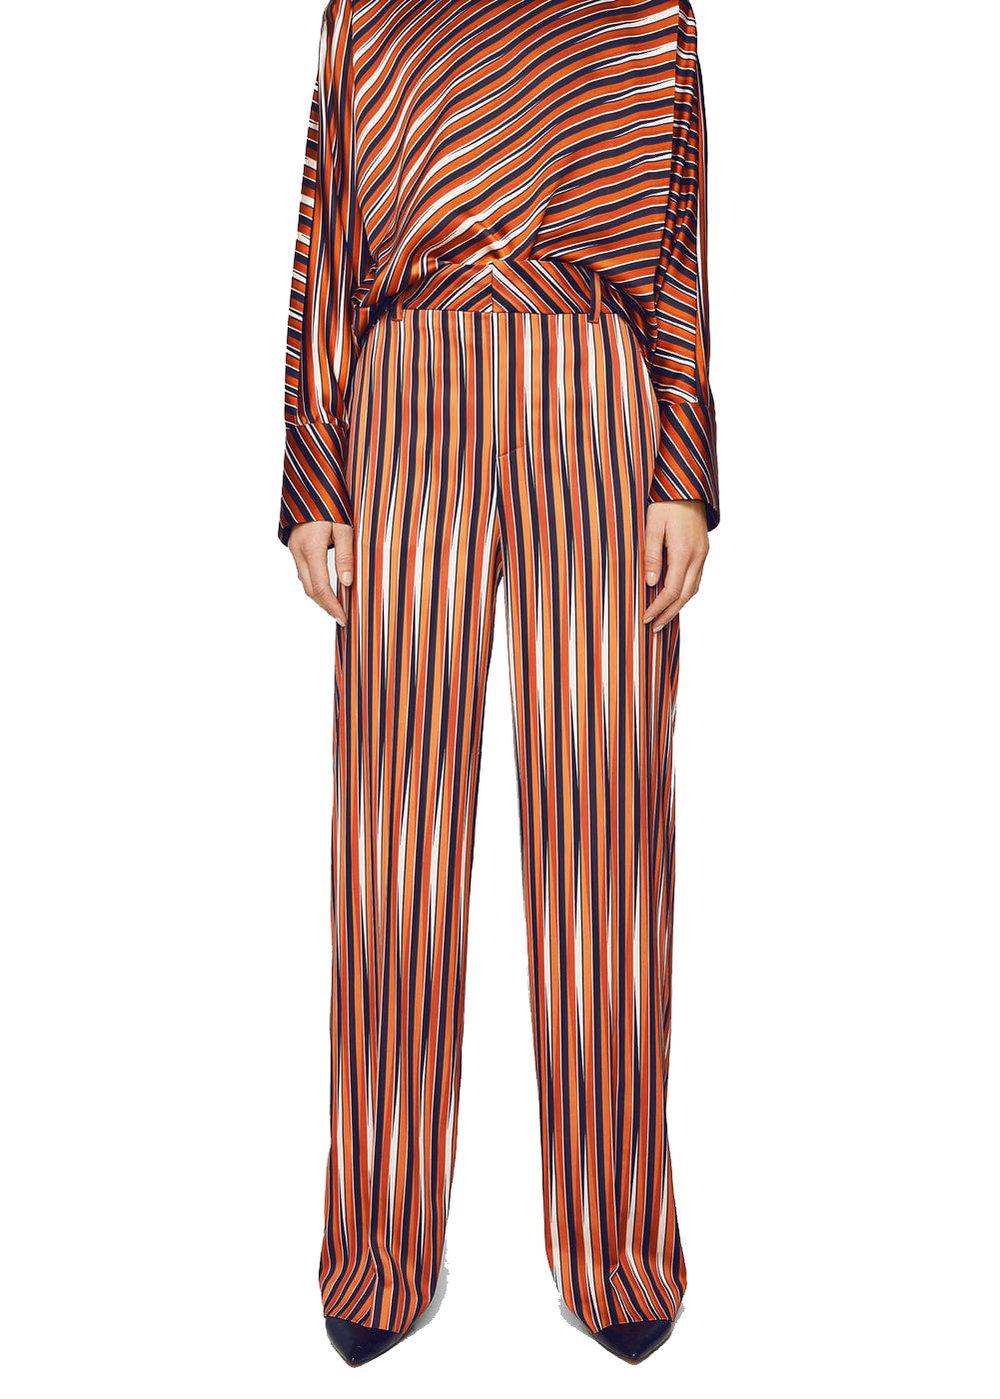 Mango Satin Striped Set